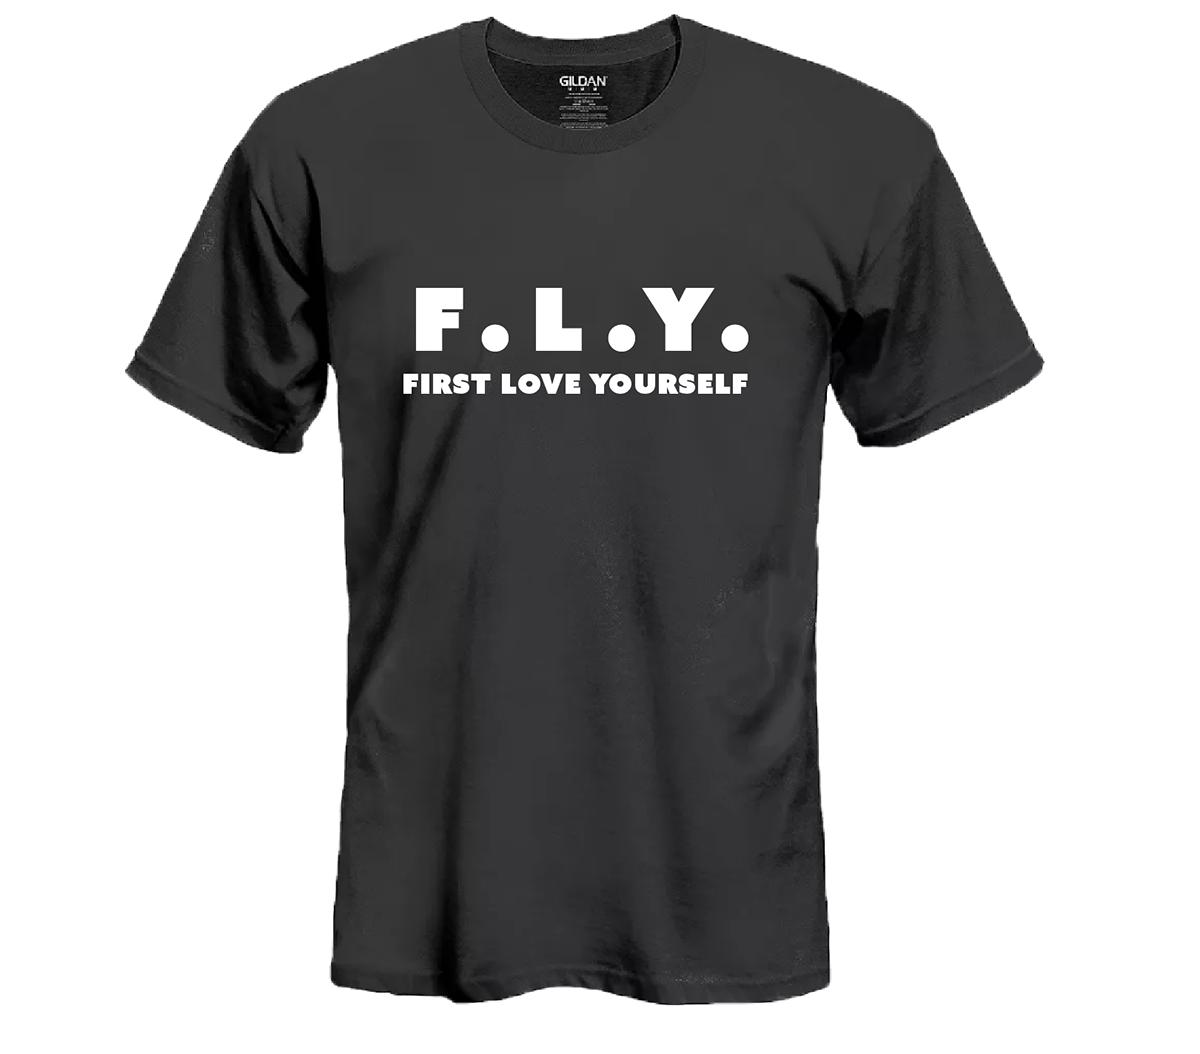 Toby Inc. F.L.Y. T-shirt Black